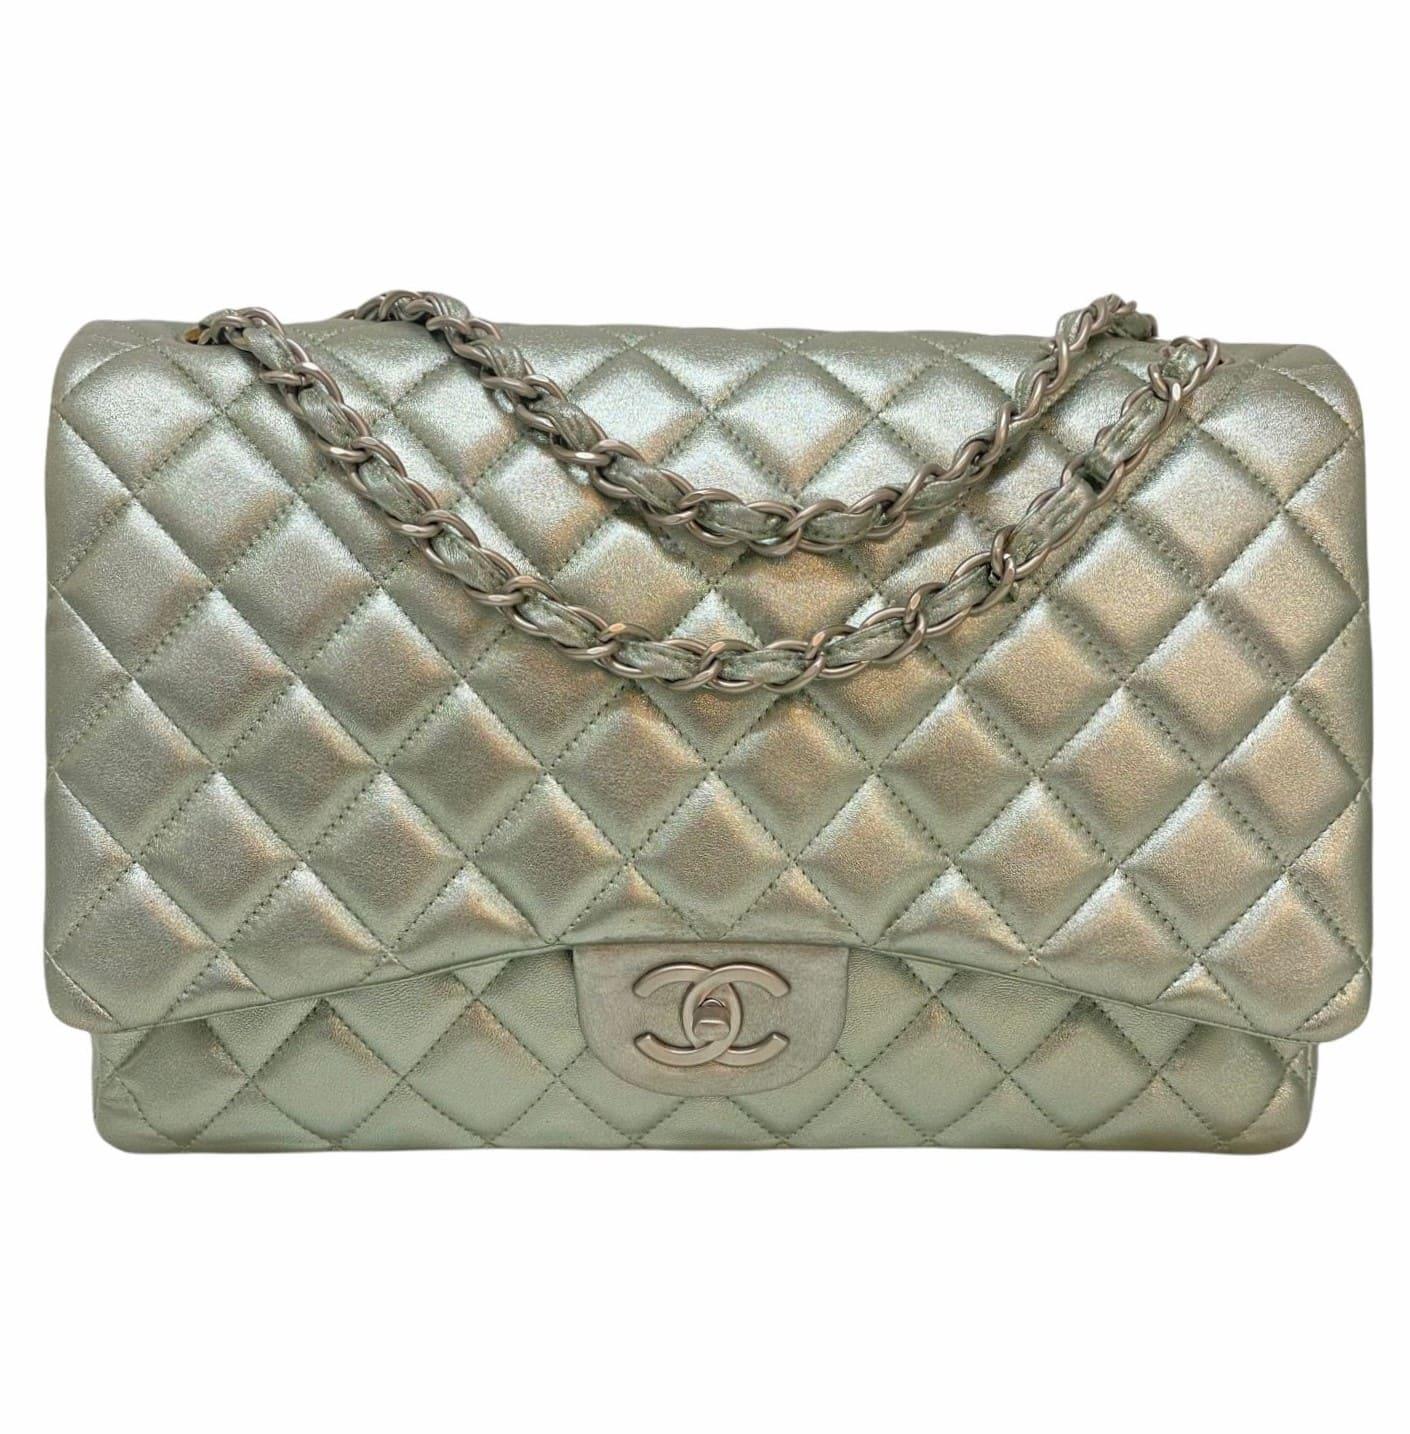 Bolsa Chanel Classic Double Flap Maxi Silver Metallic